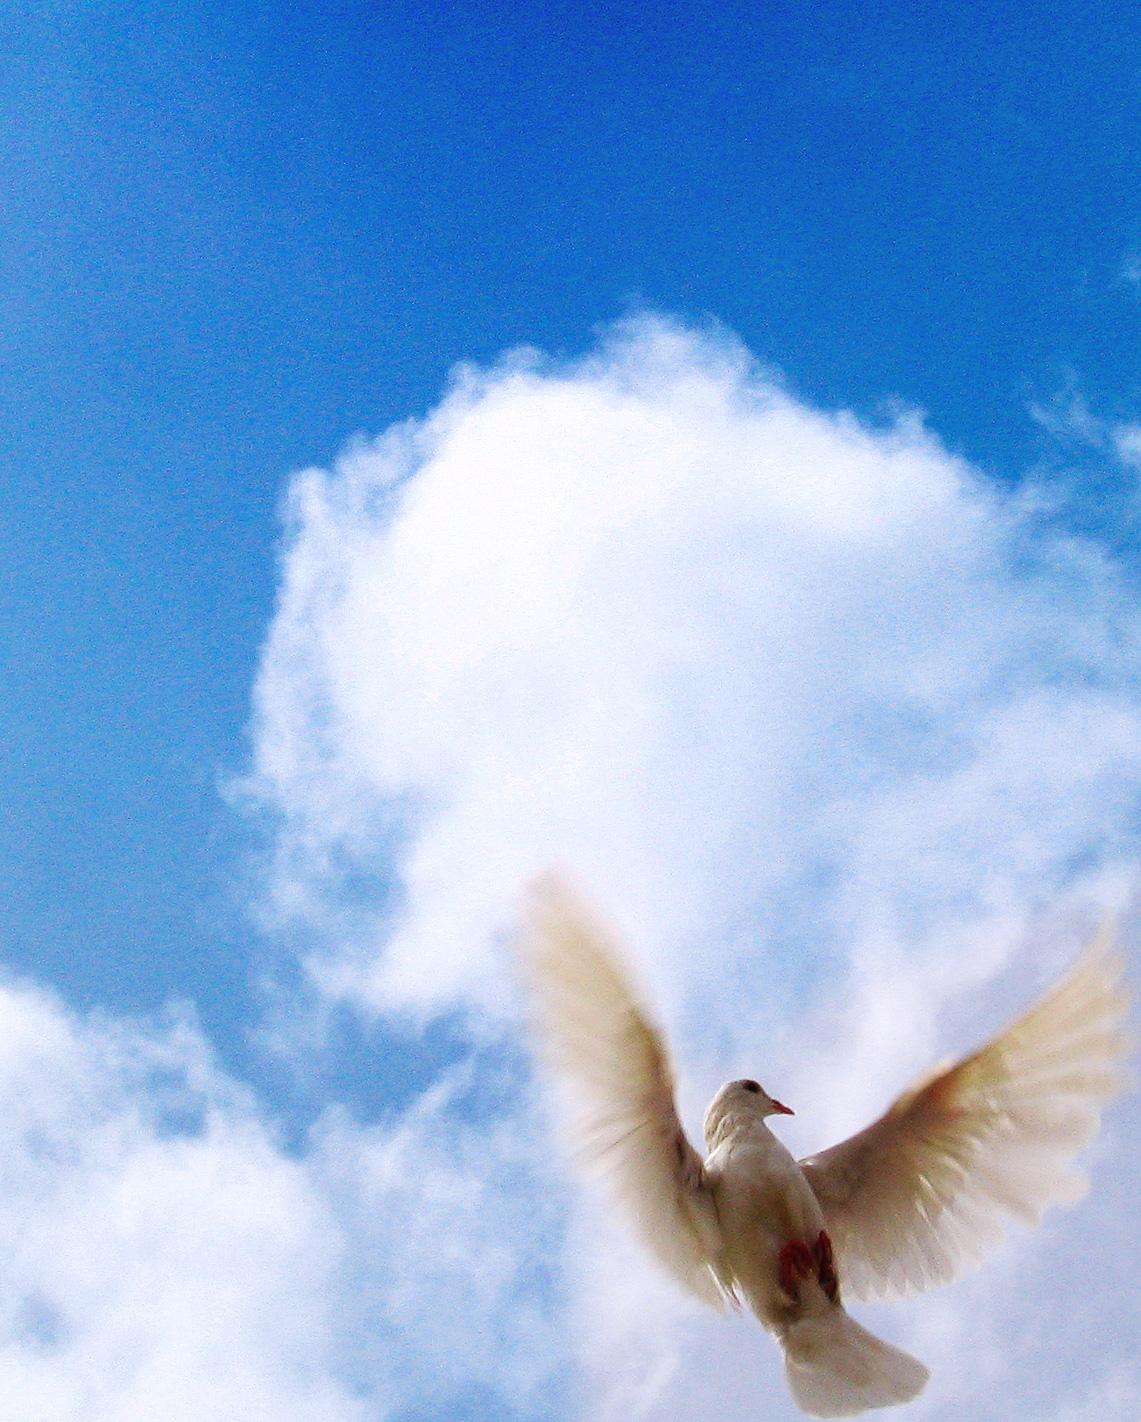 Duchovní dary, charismatické dary, Dary Ducha svatého